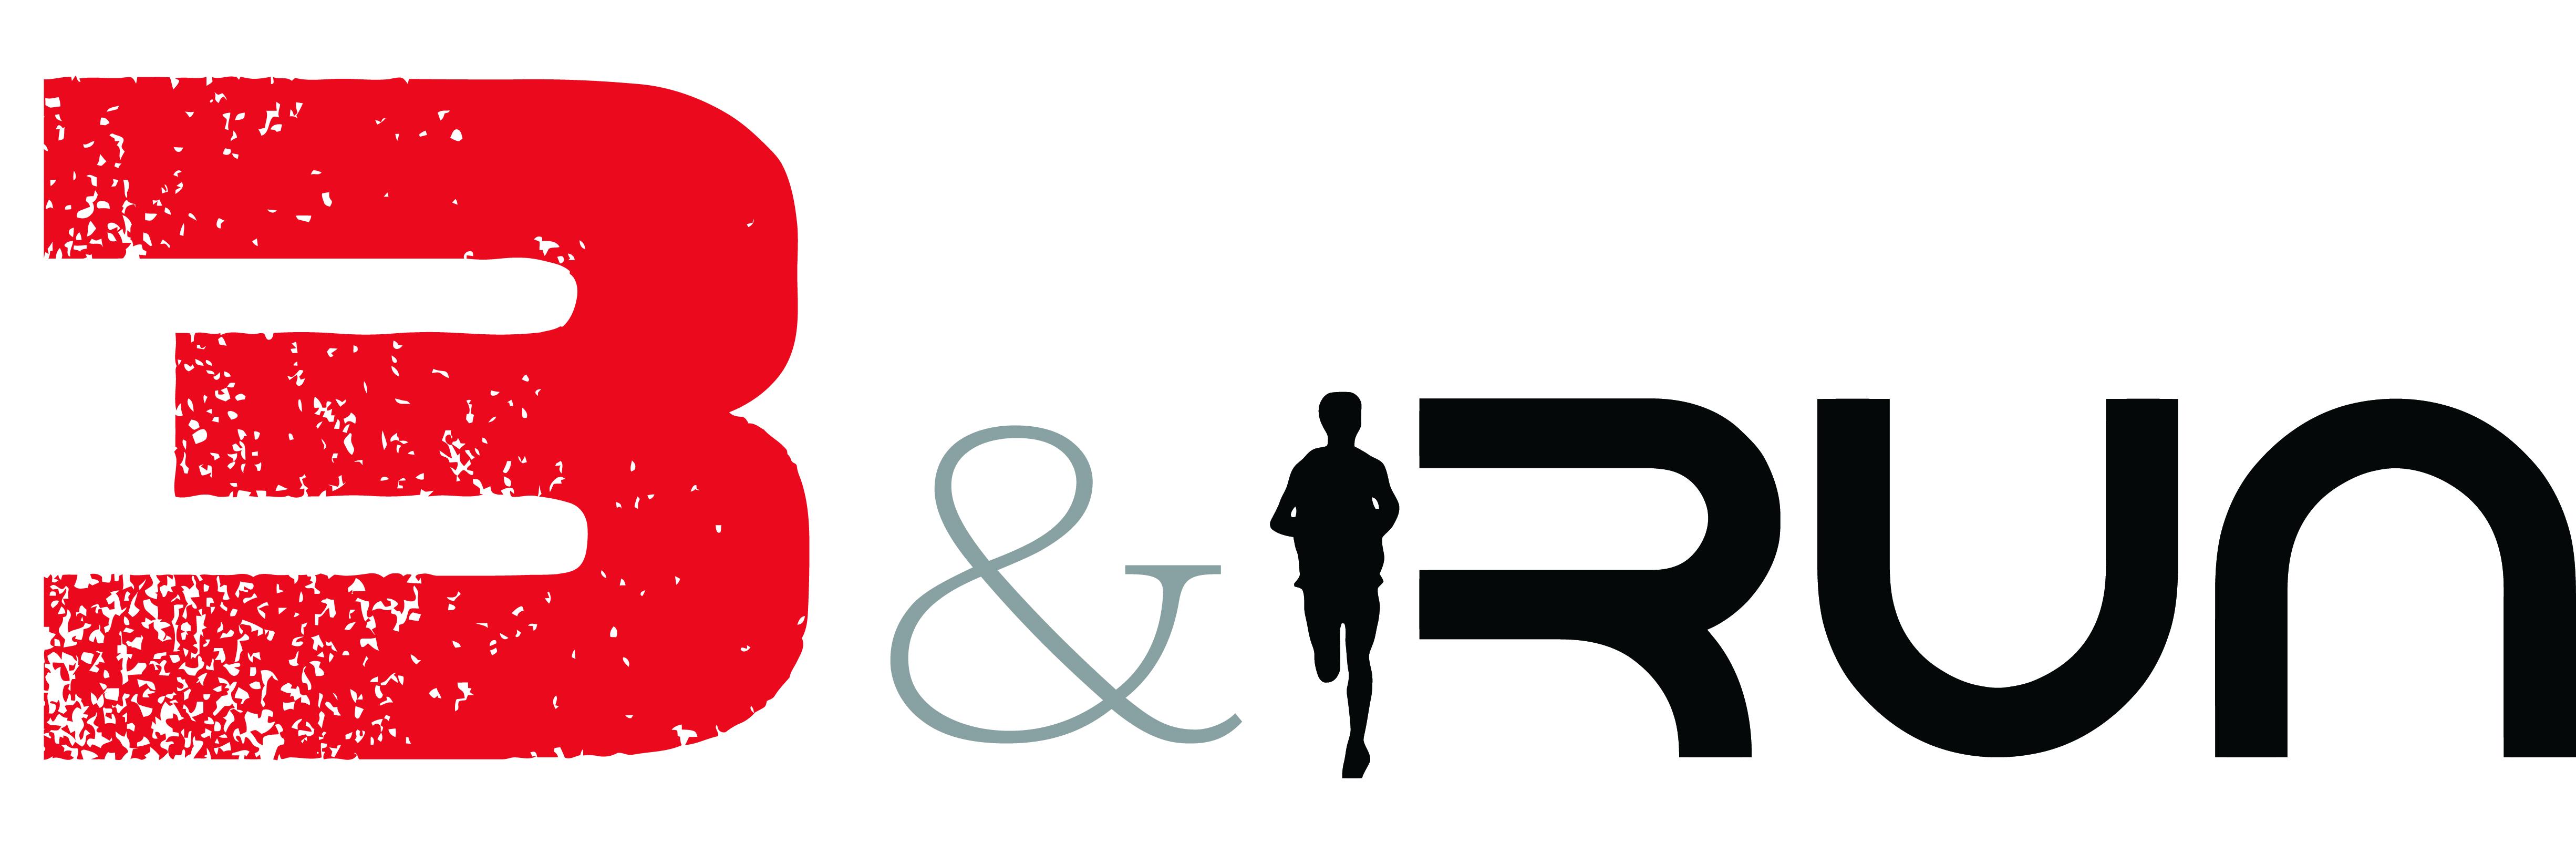 3&Run Club de Corredores by Pedro Nimo